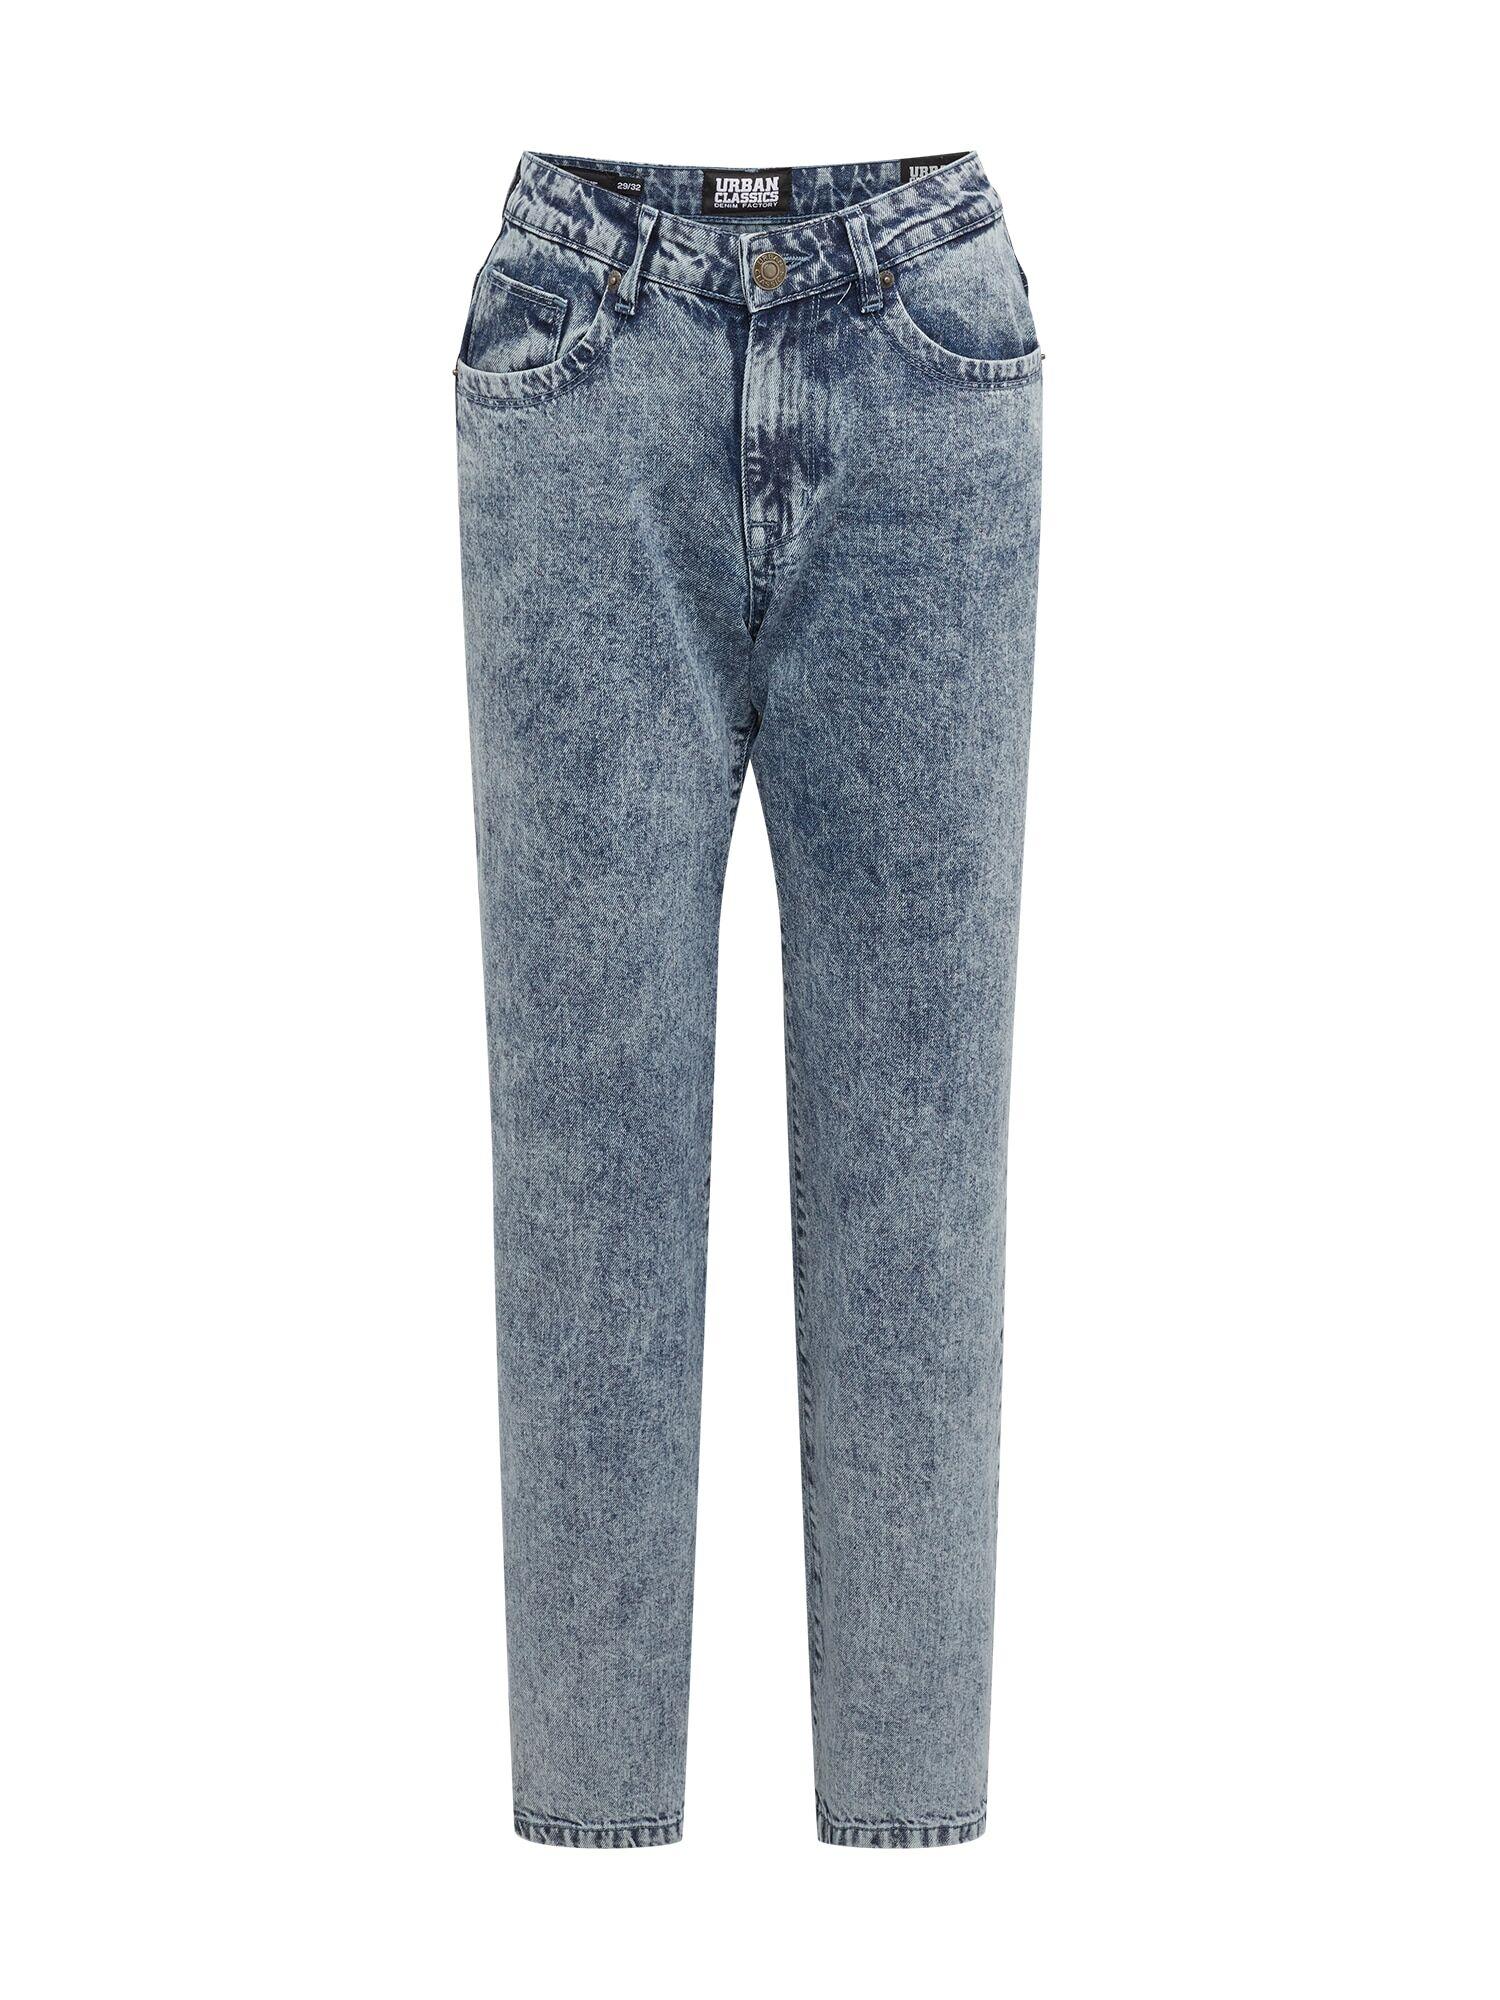 Urban Classics Jean  - Bleu - Taille: 28 - male